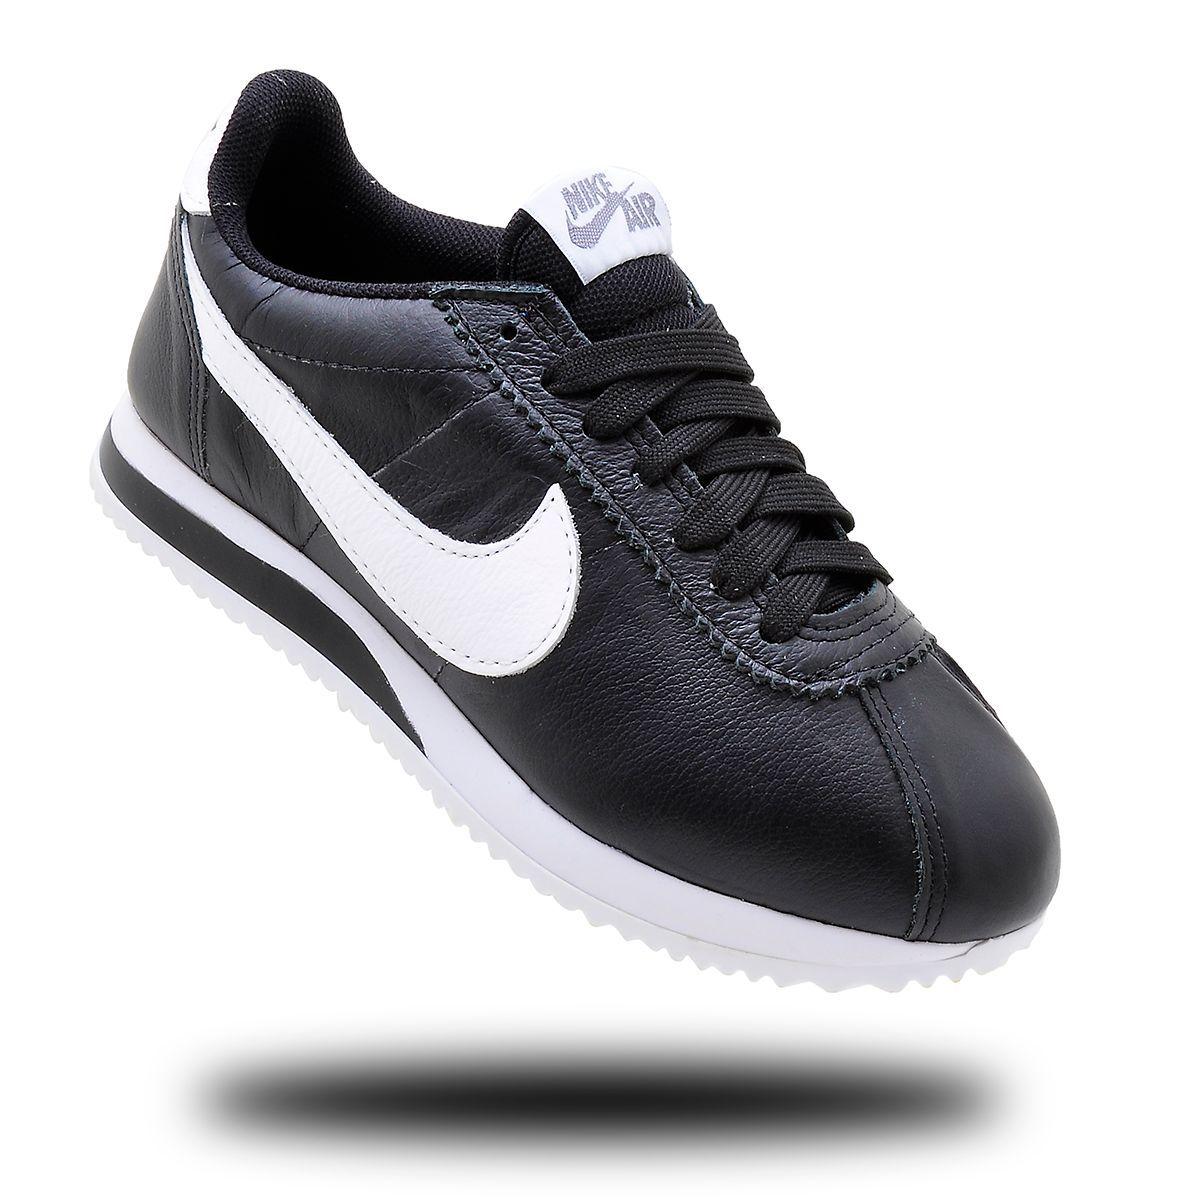 meet 16631 83566 Tênis Nike Cortez Leather Preto com Branco Cano Baixo Nº 37   Tênis  Feminino Nike Nunca Usado 33771229   enjoei